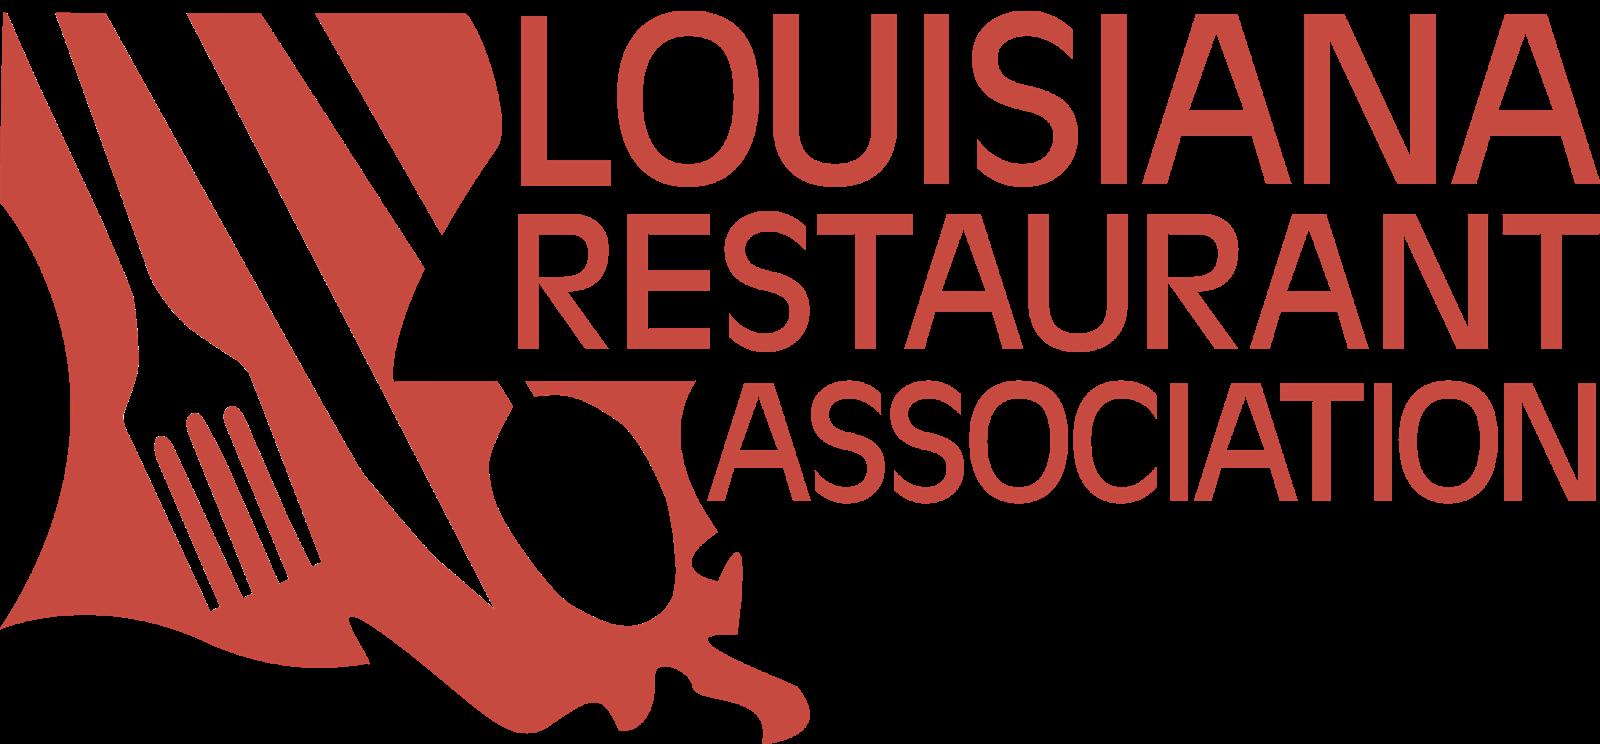 Louisiana Restaurant Association Logo